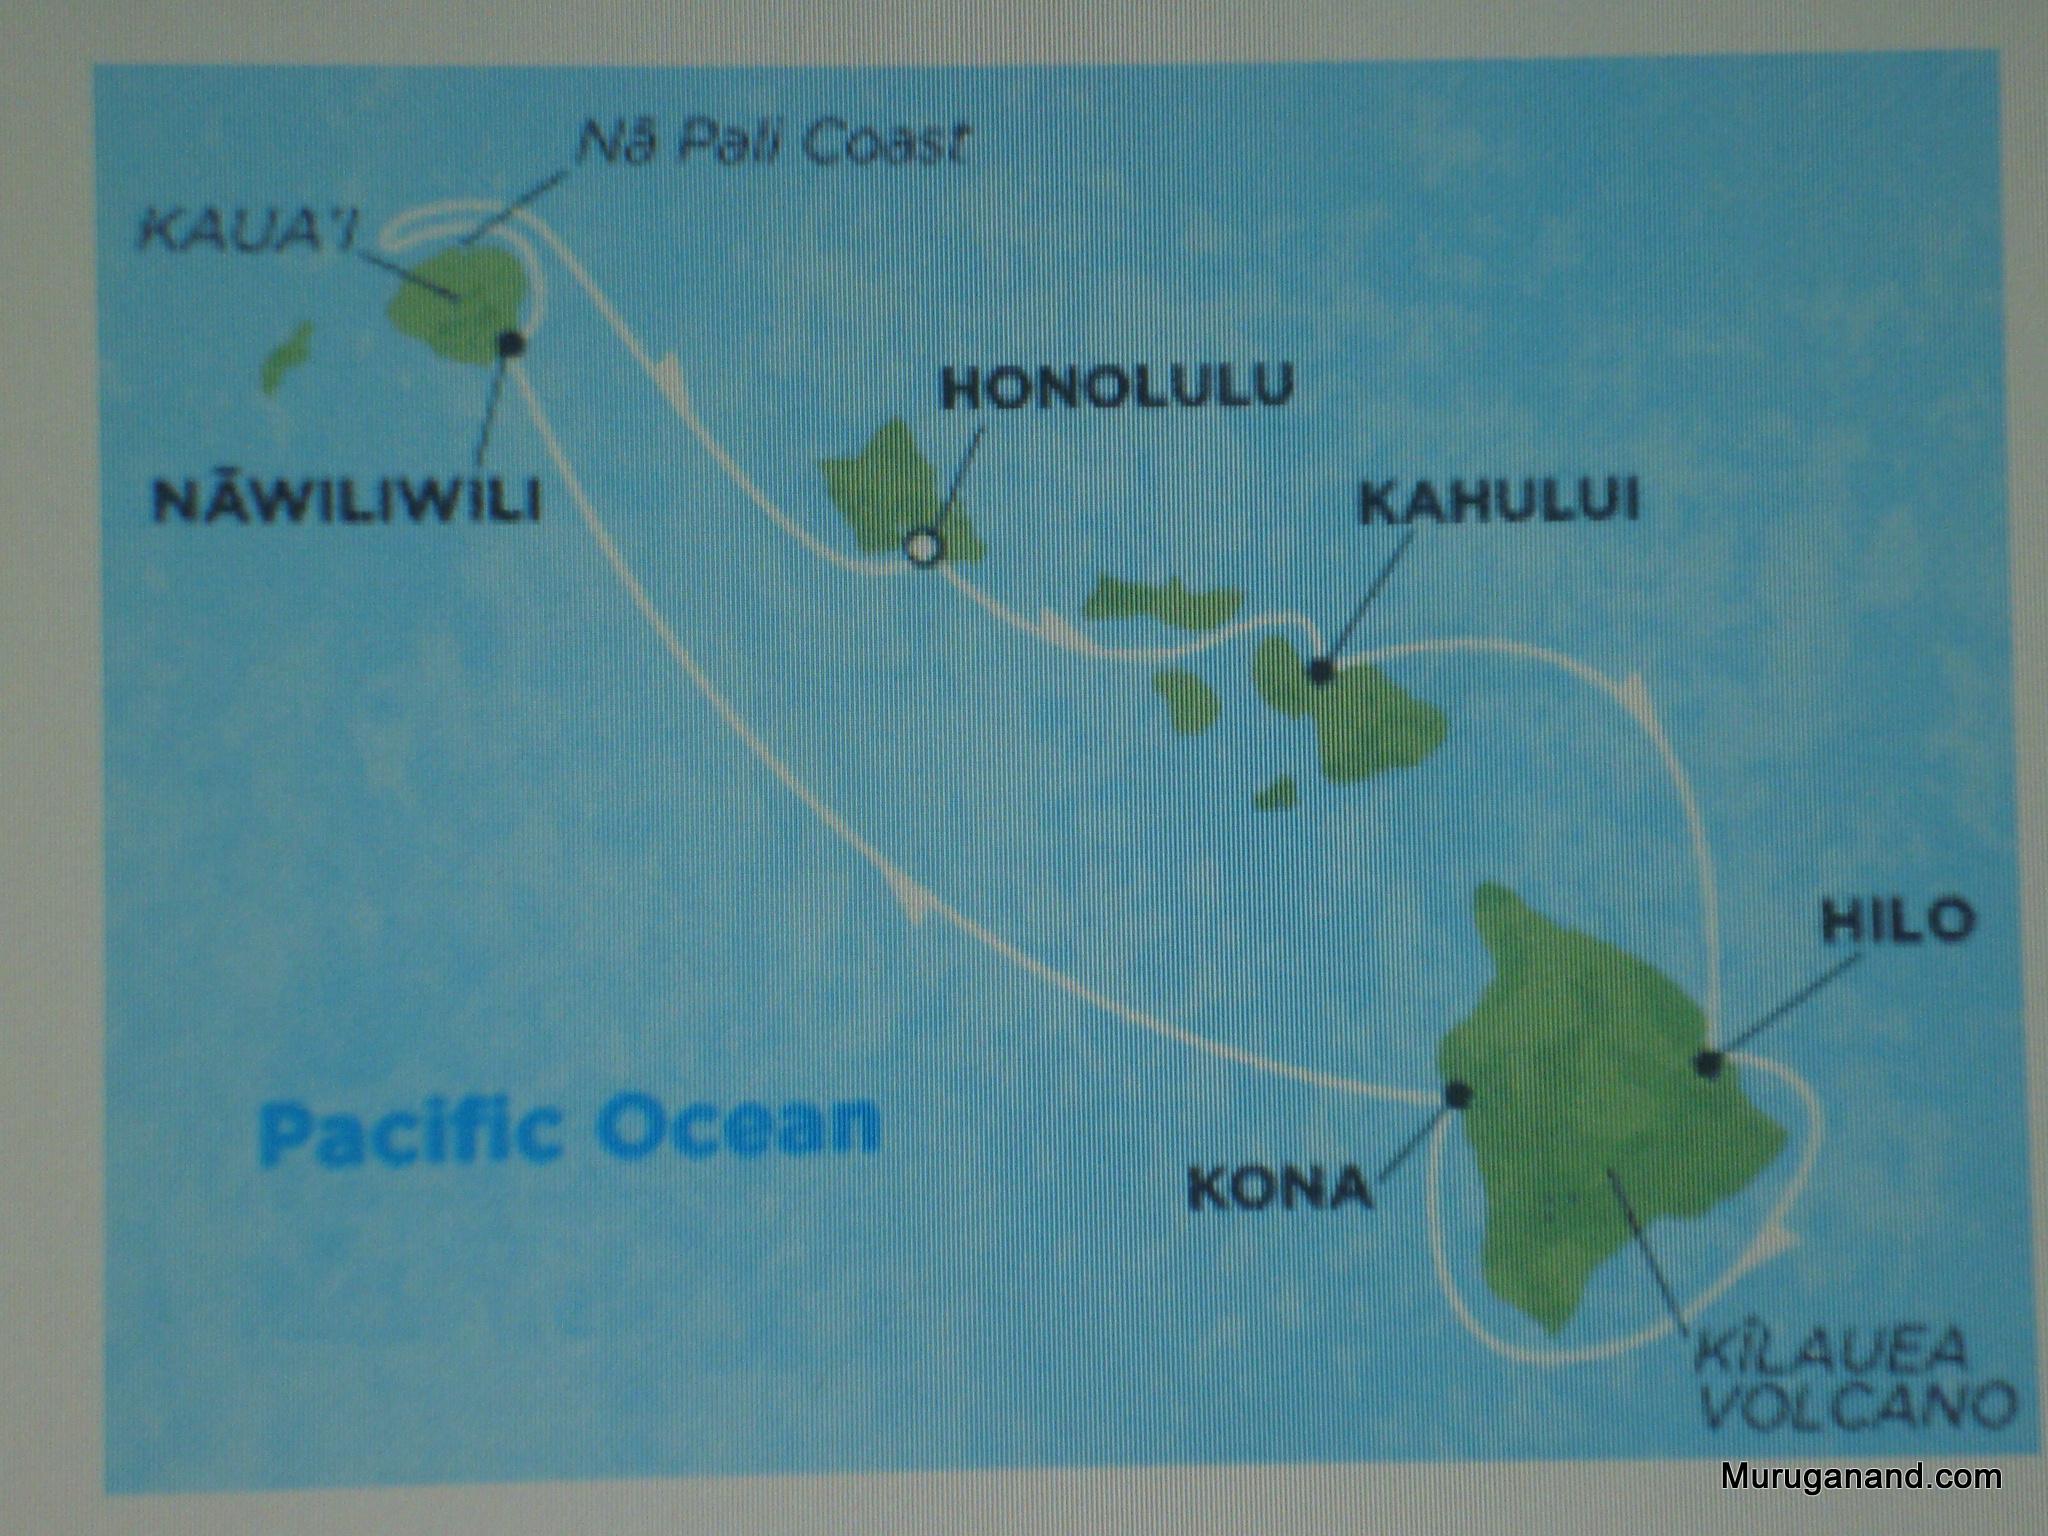 Tour Starts in Honolulu